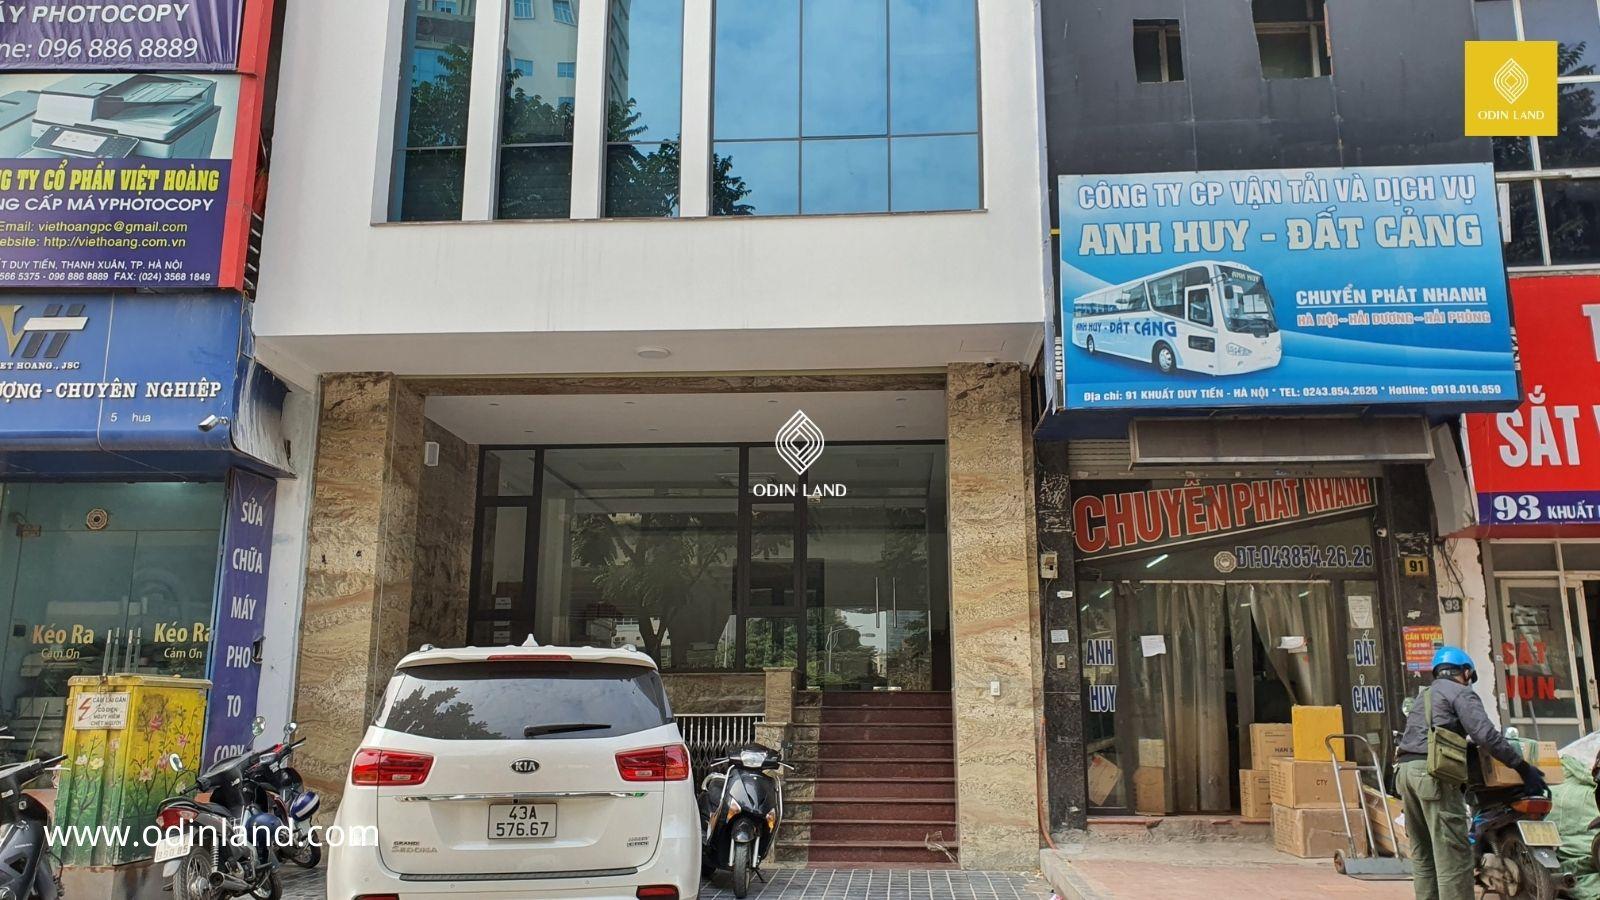 Van Phong Cho Thue Toa Nha 87 89 Khuat Duy Tien 1